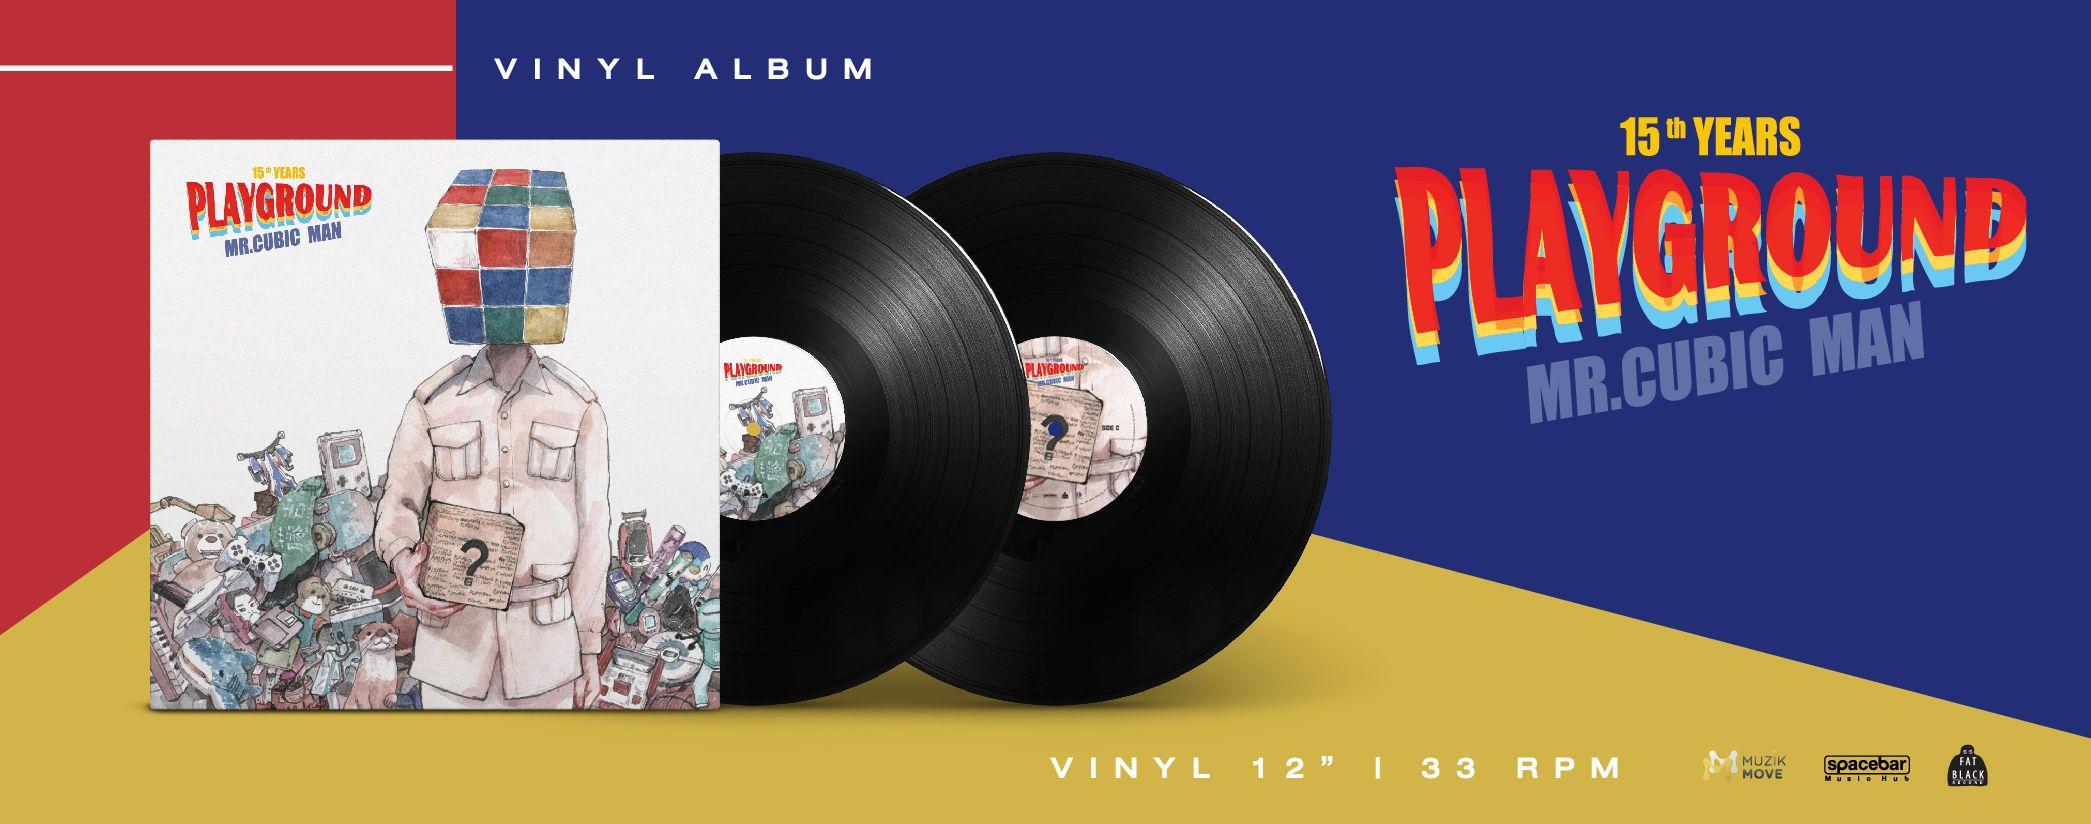 "PLAYGROUND ""MR. CUBIC MAN 15 Years Ago"" Album Vinyl"